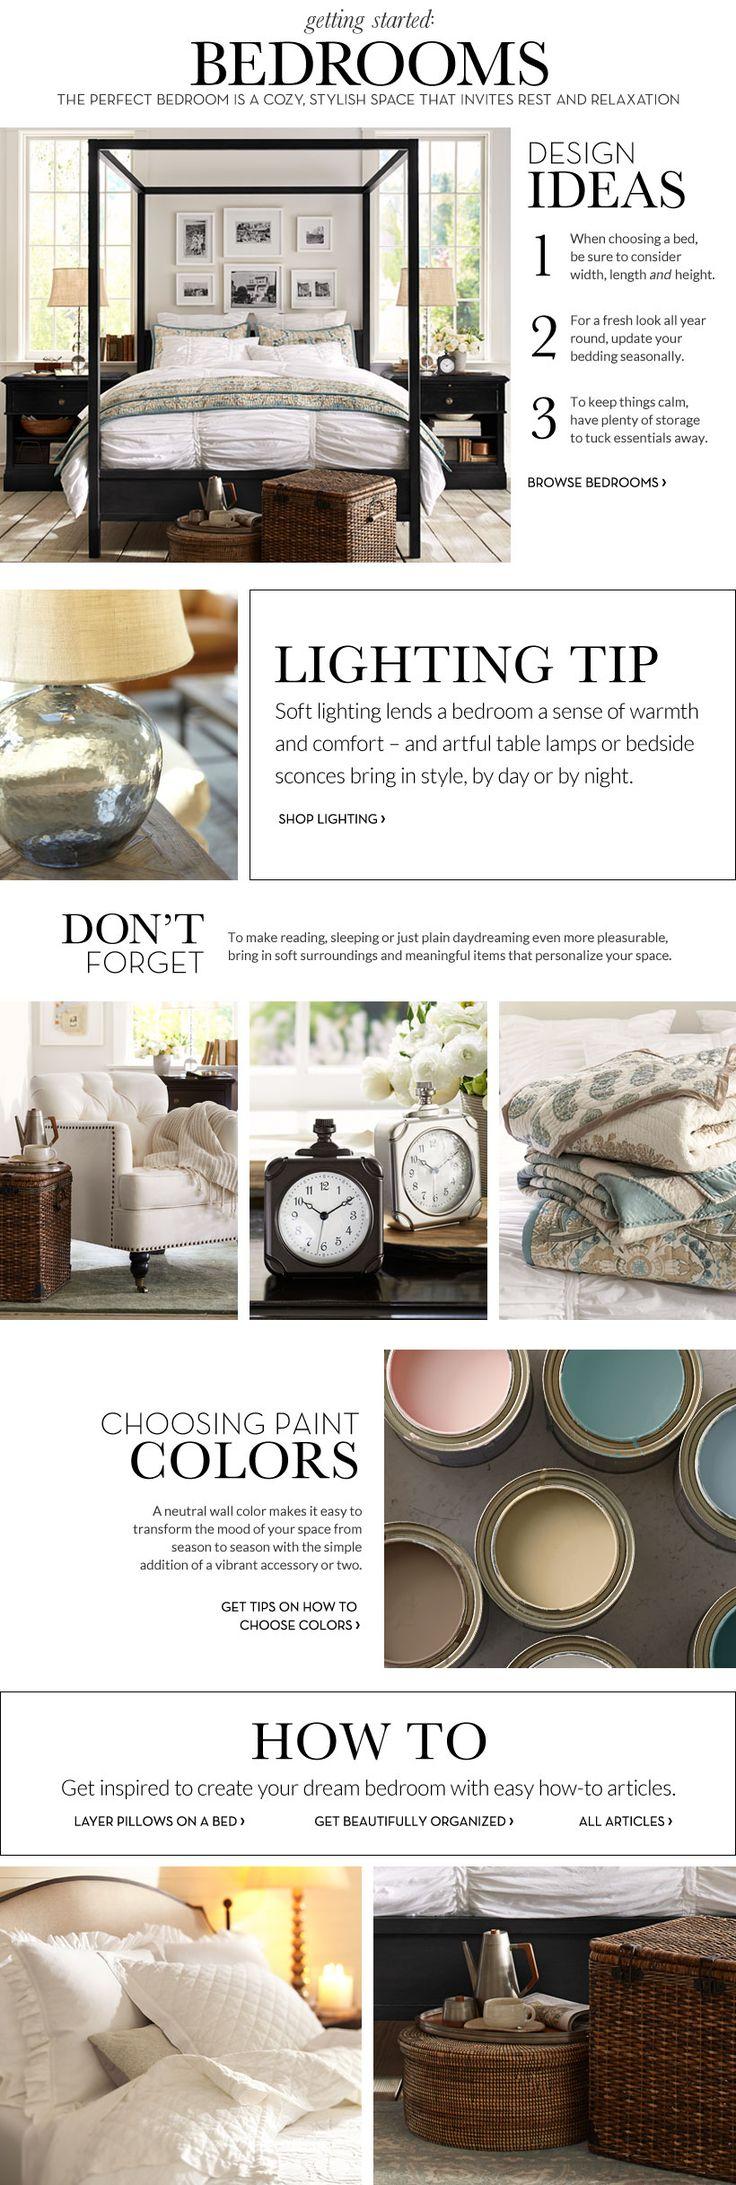 Bedroom Decorating Ideas | Bedroom Decorating Decor | Pottery Barn